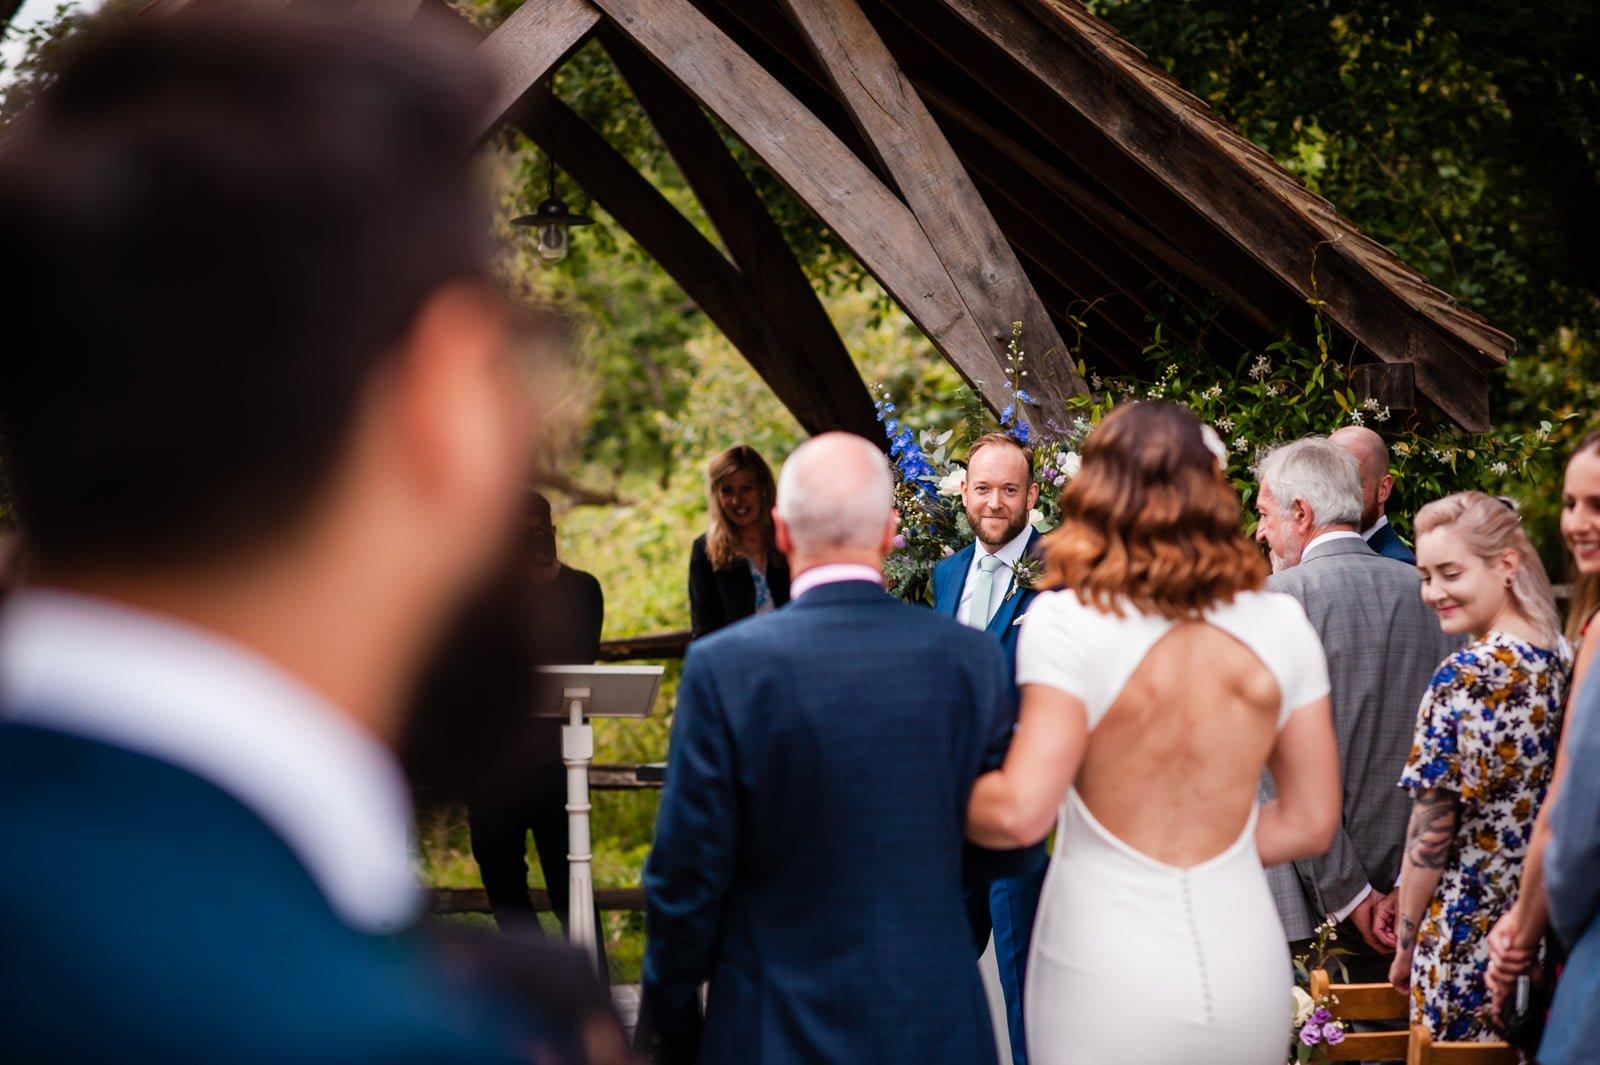 Millbridge Court Wedding - stunning summer wedding - wedding photography 54